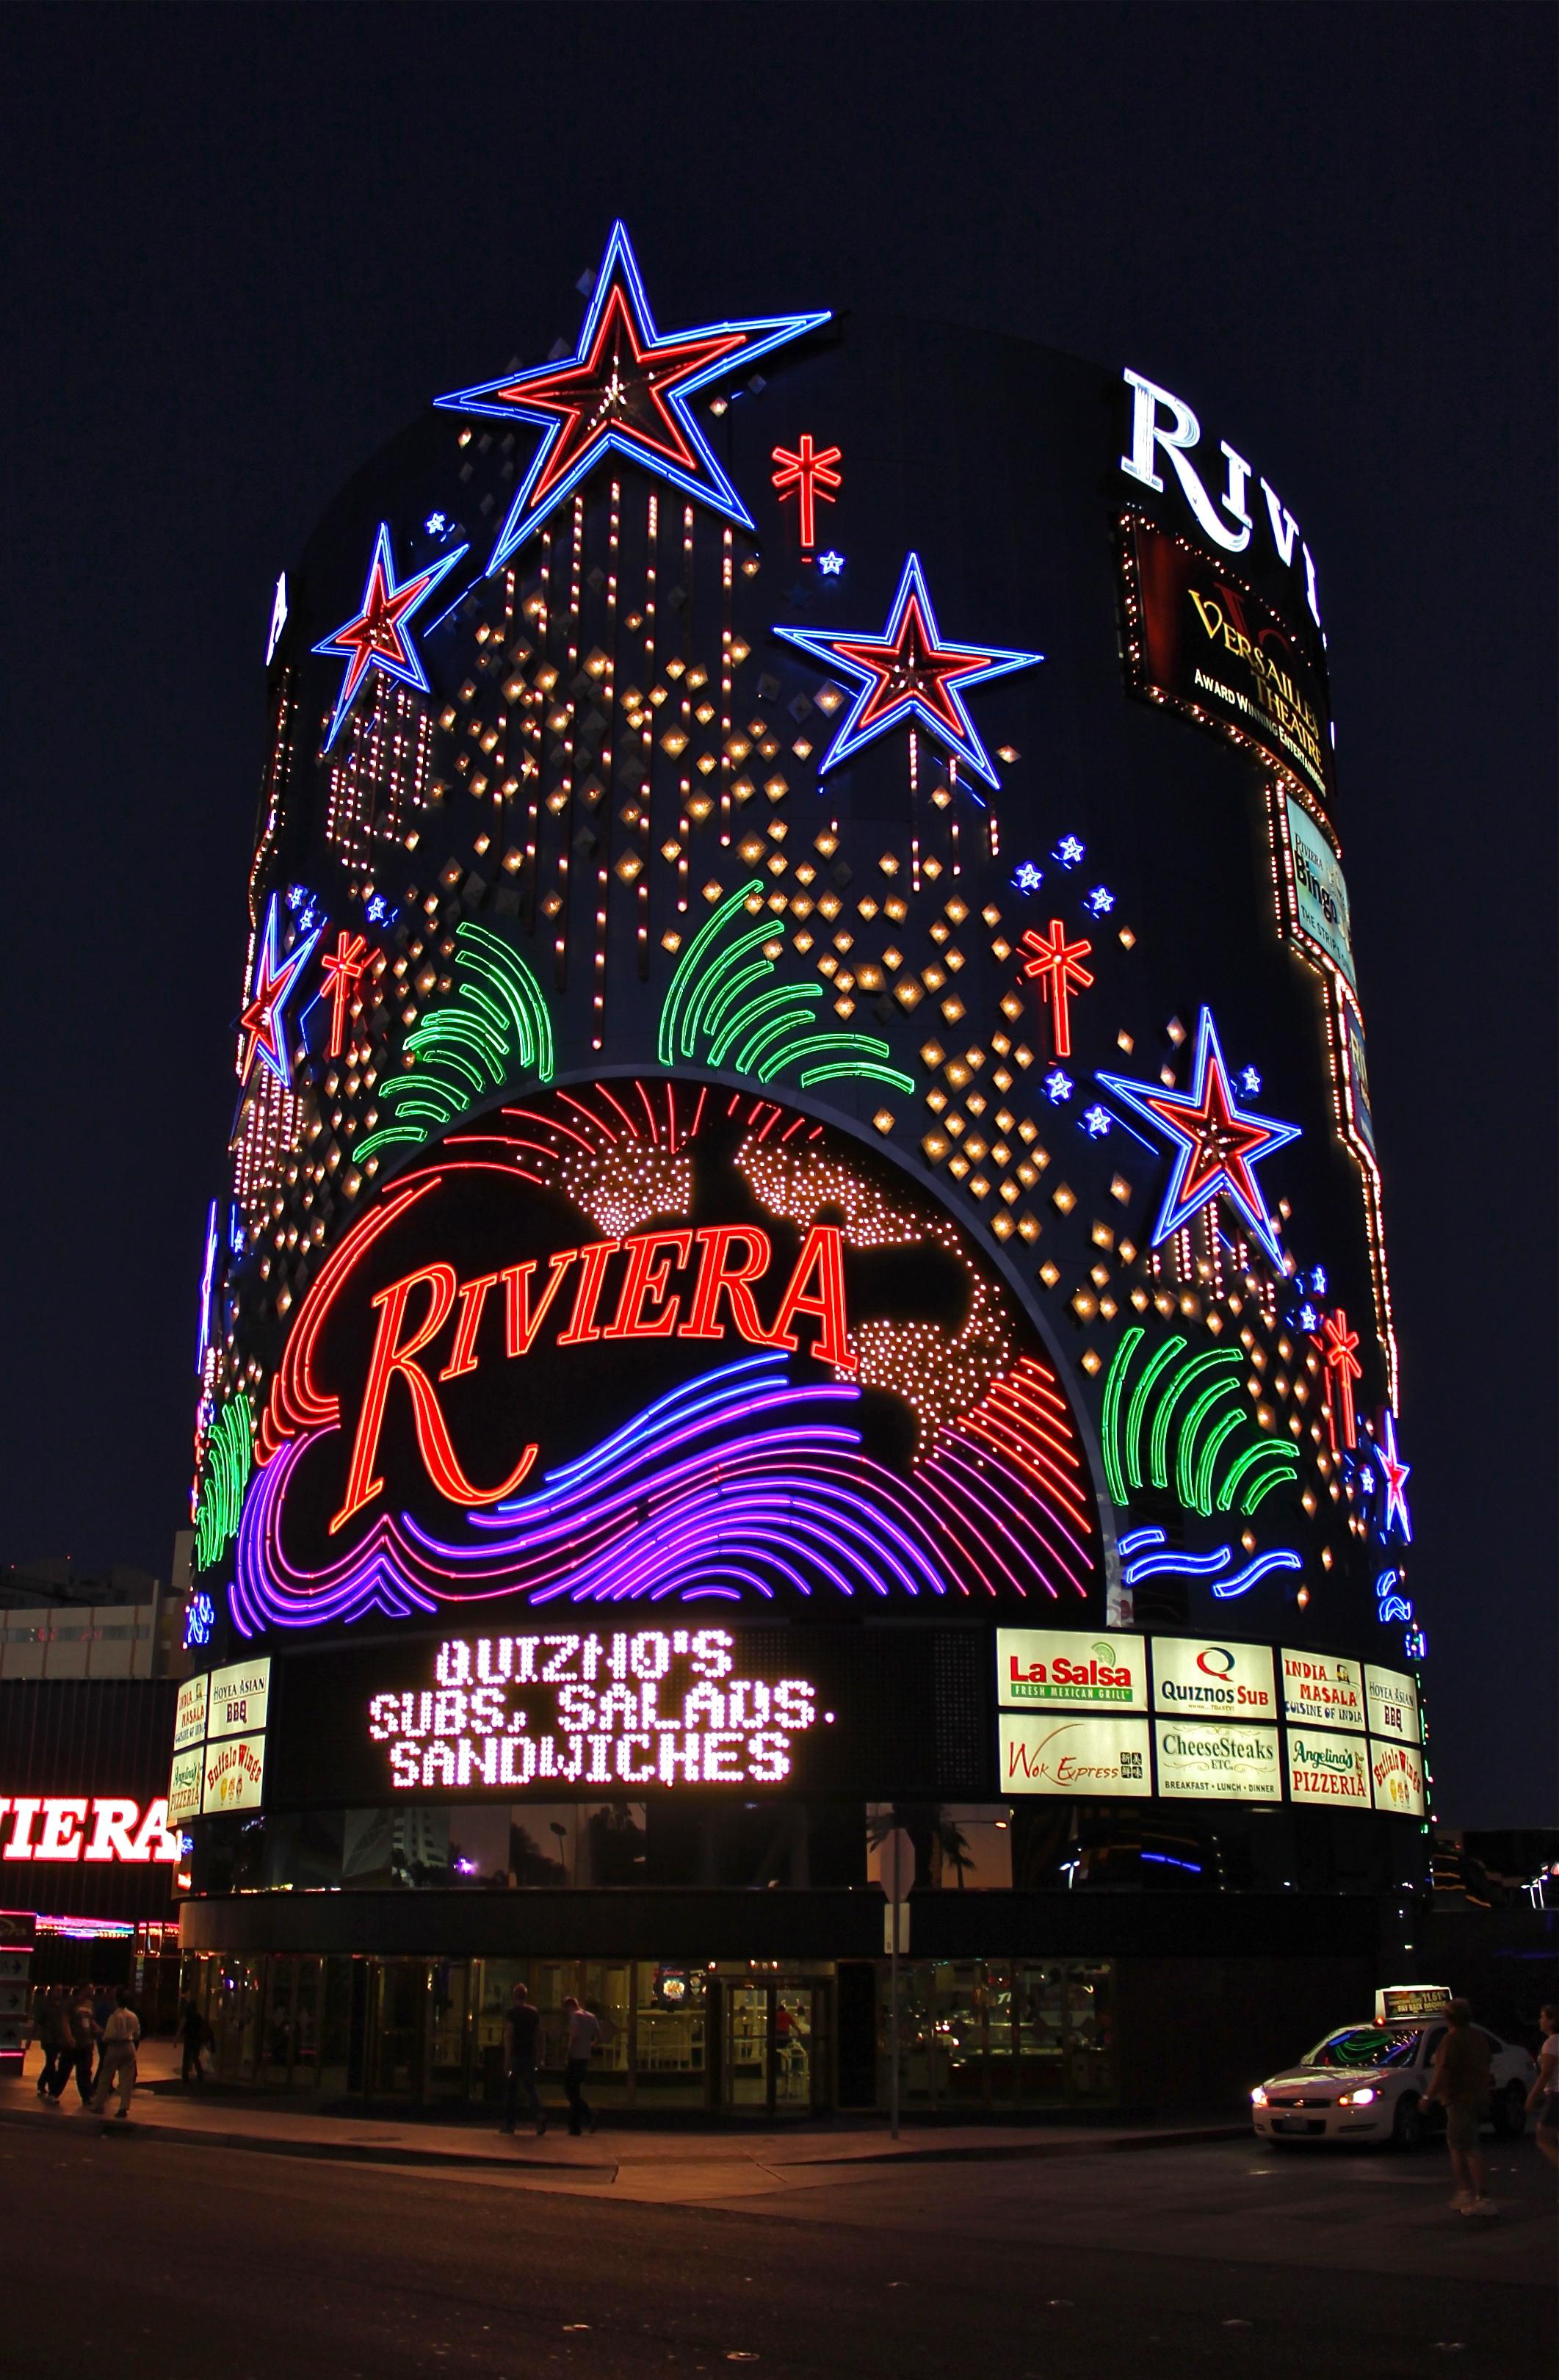 Casino riveira gambling industry statistics australia